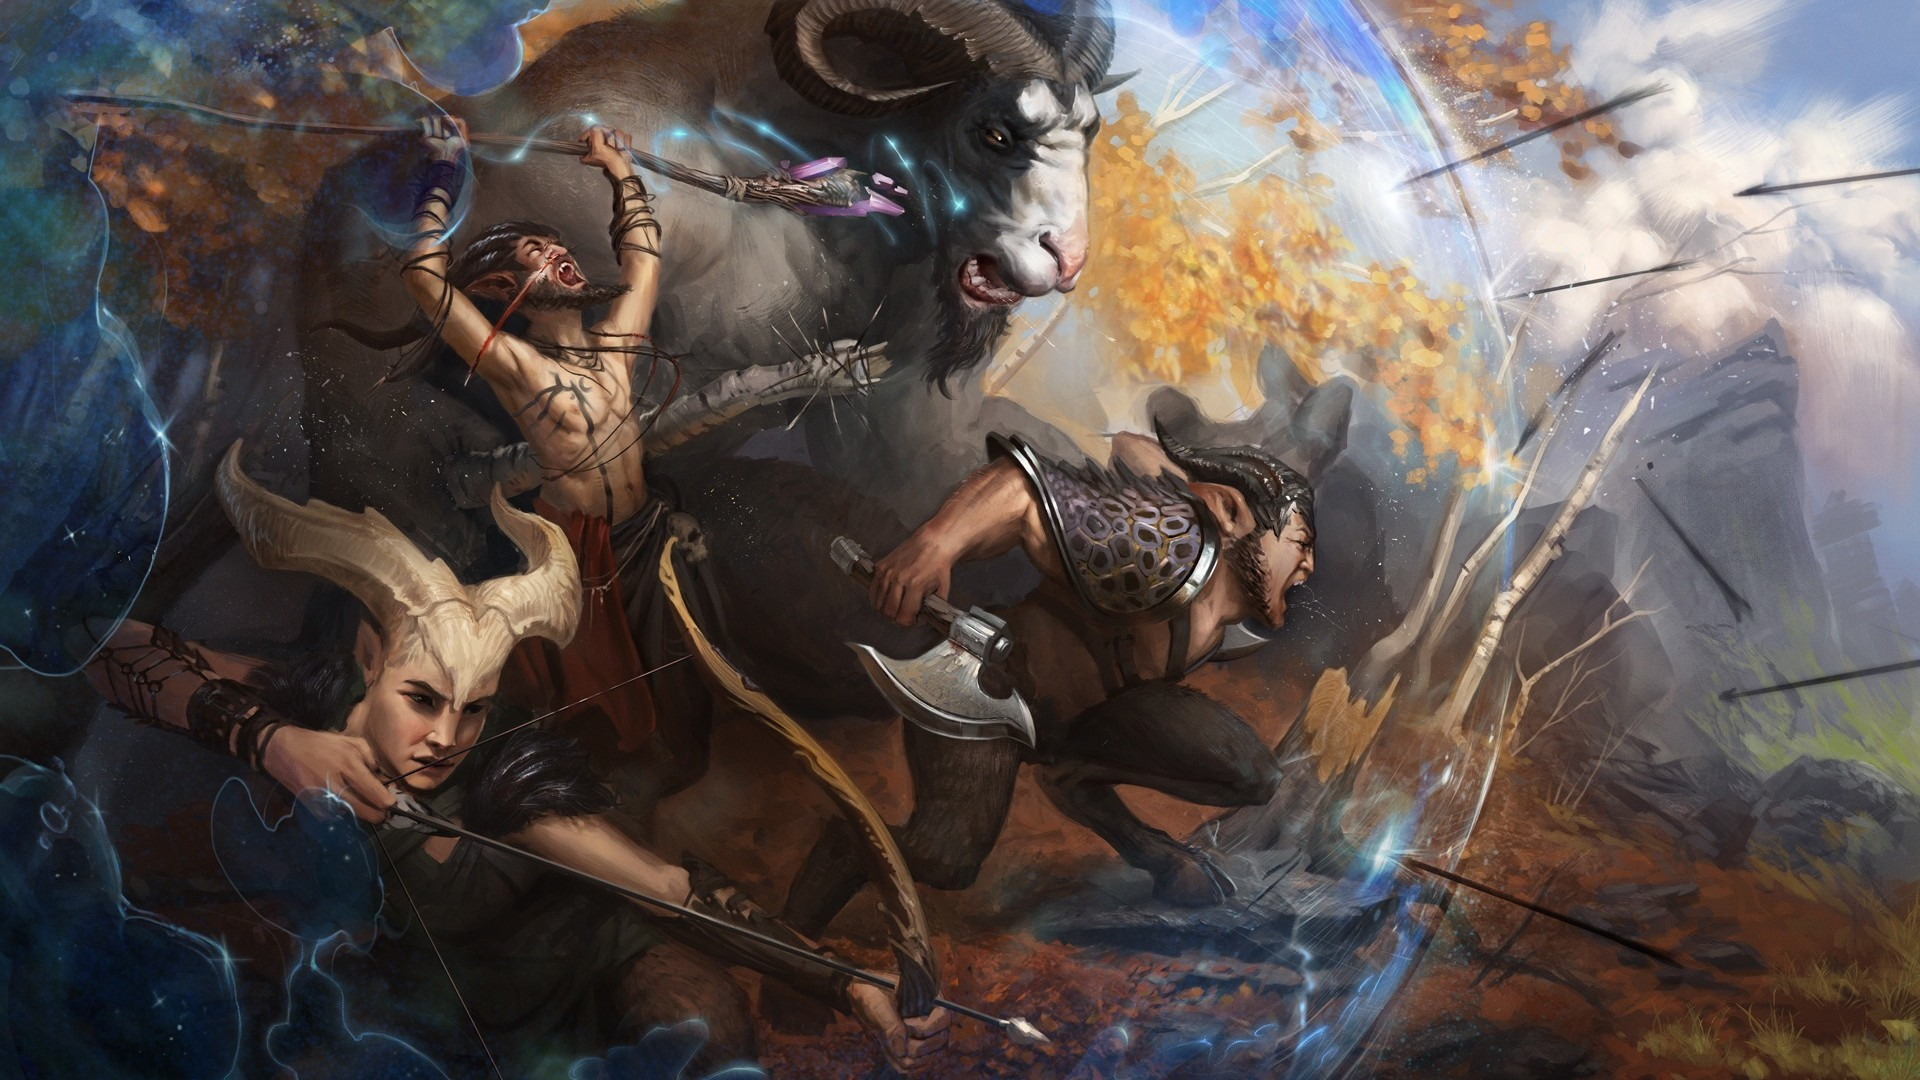 Res: 1920x1080, Satyr, Greek Mythology, Creatures, Horns, Bow, War, Artwork